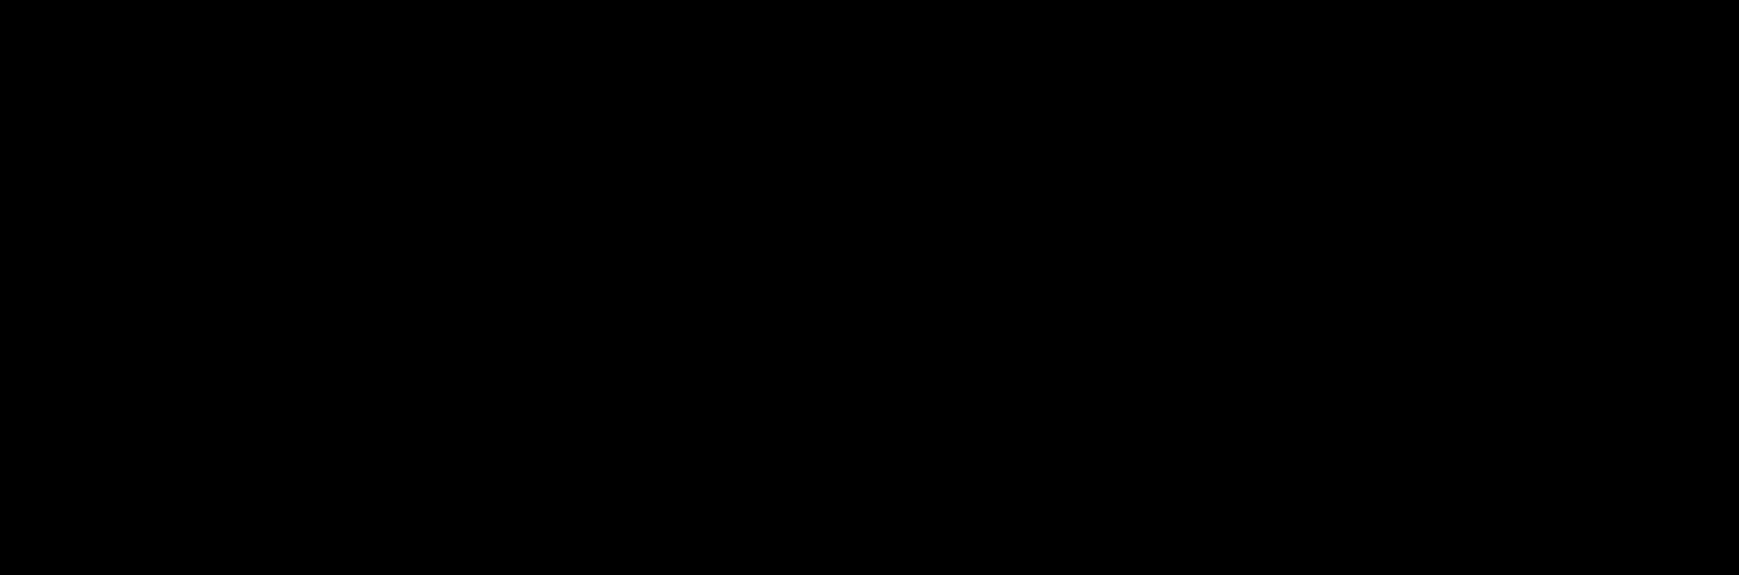 image78.png